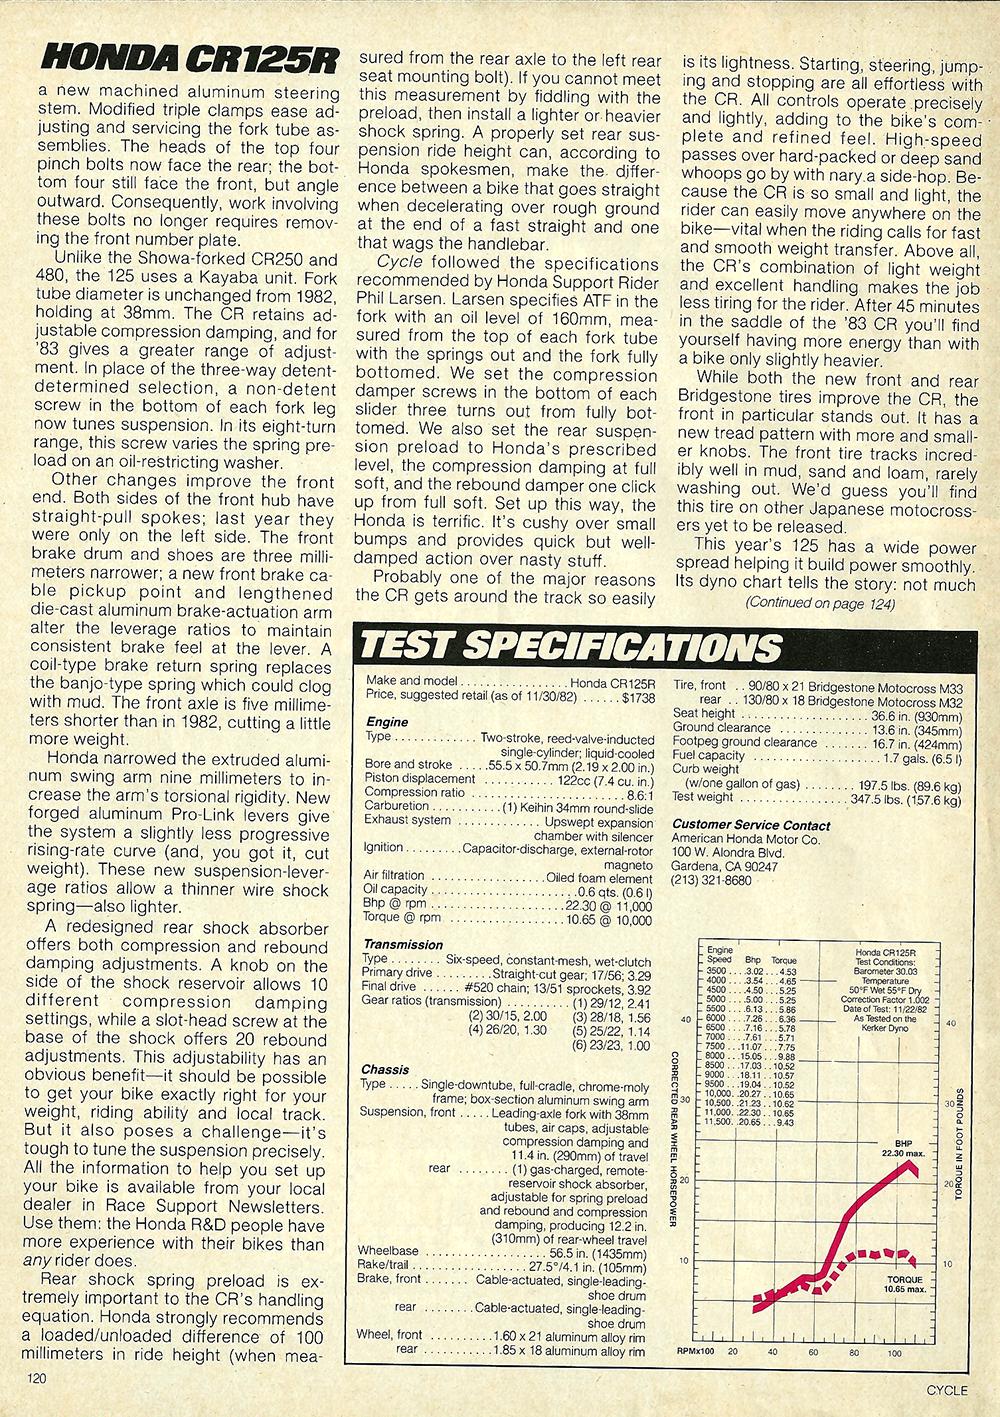 1983 Honda CR125R road test 7.jpg